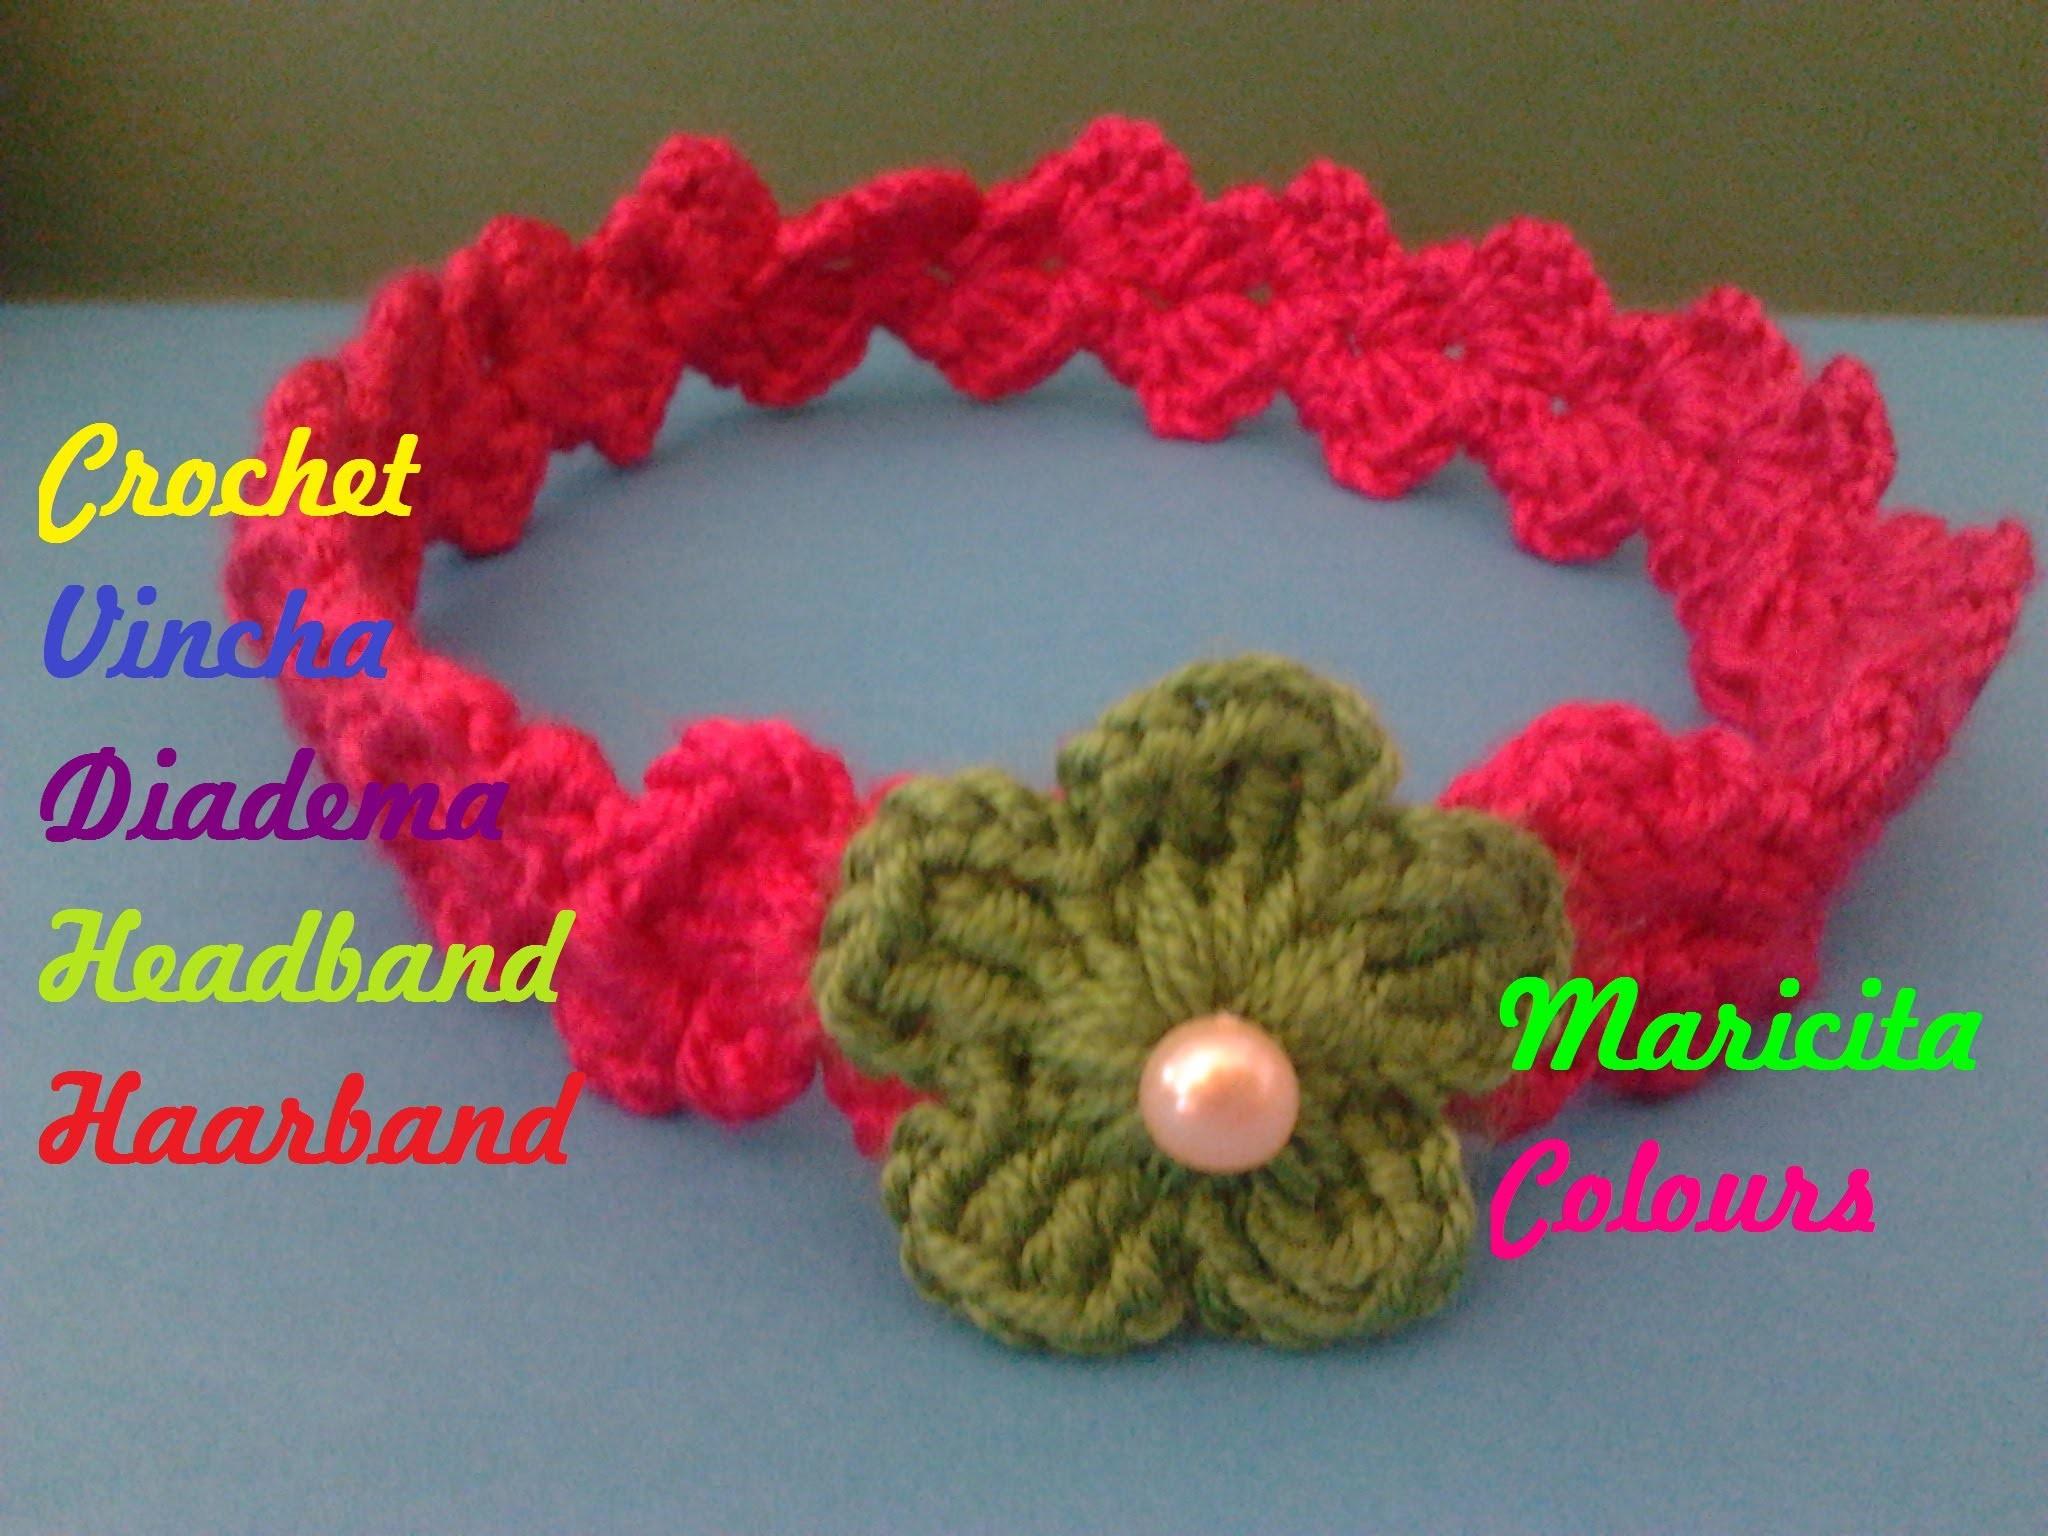 "Crochet Tutorial Vincha ""Mary"" Vintage Diadema Bebe Headband Subtitles English & Deutsch"